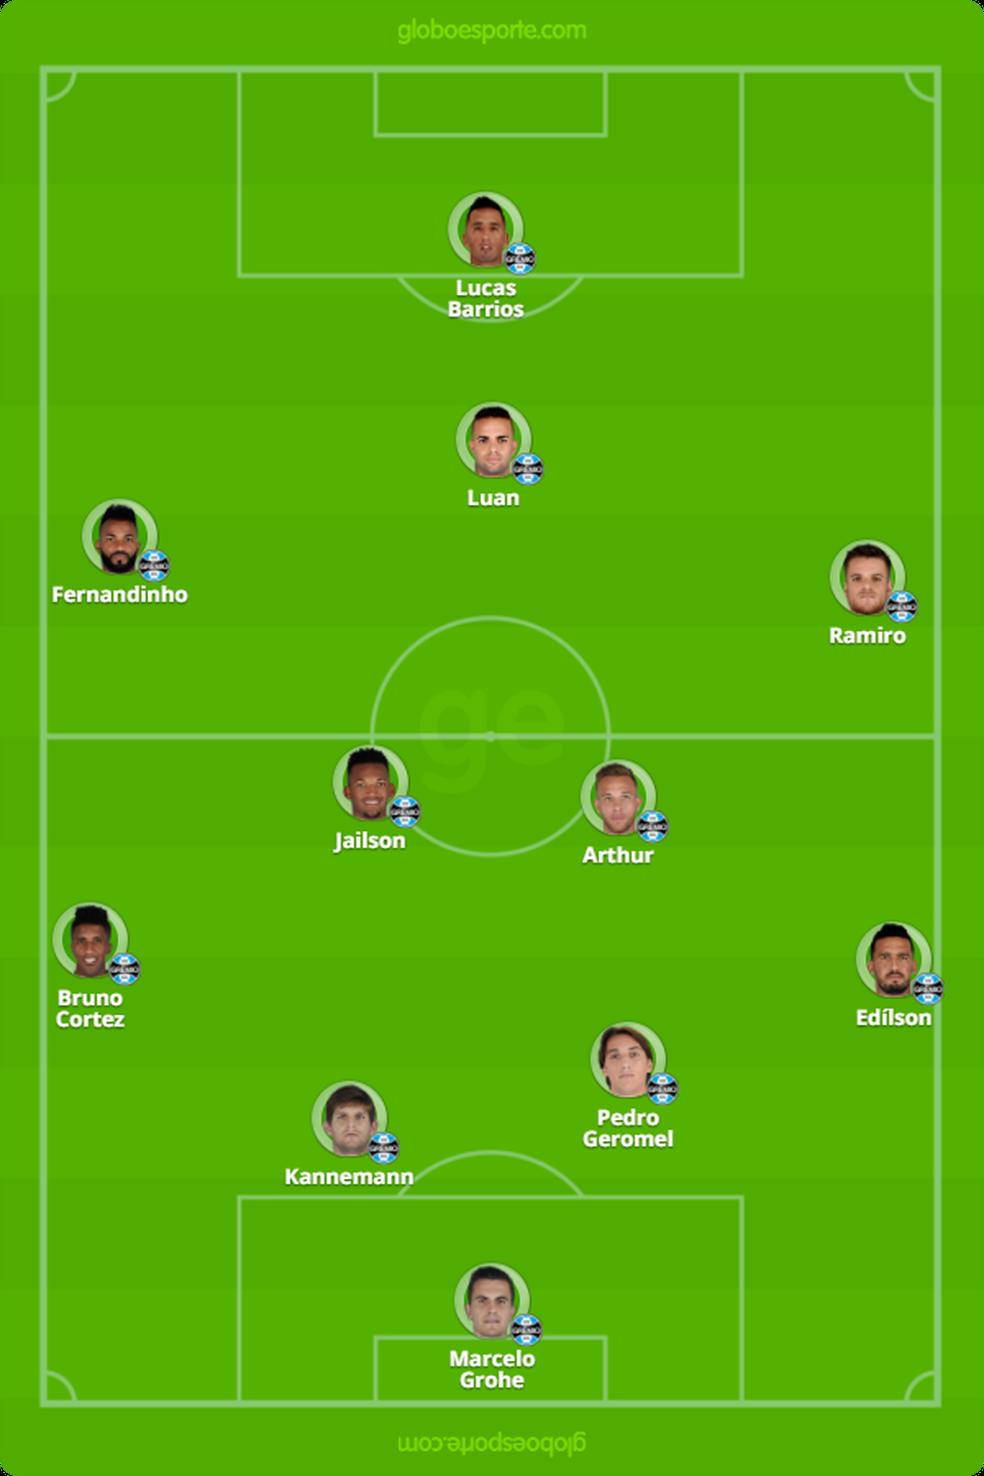 Provável time do Grêmio (Foto: Reprodução)